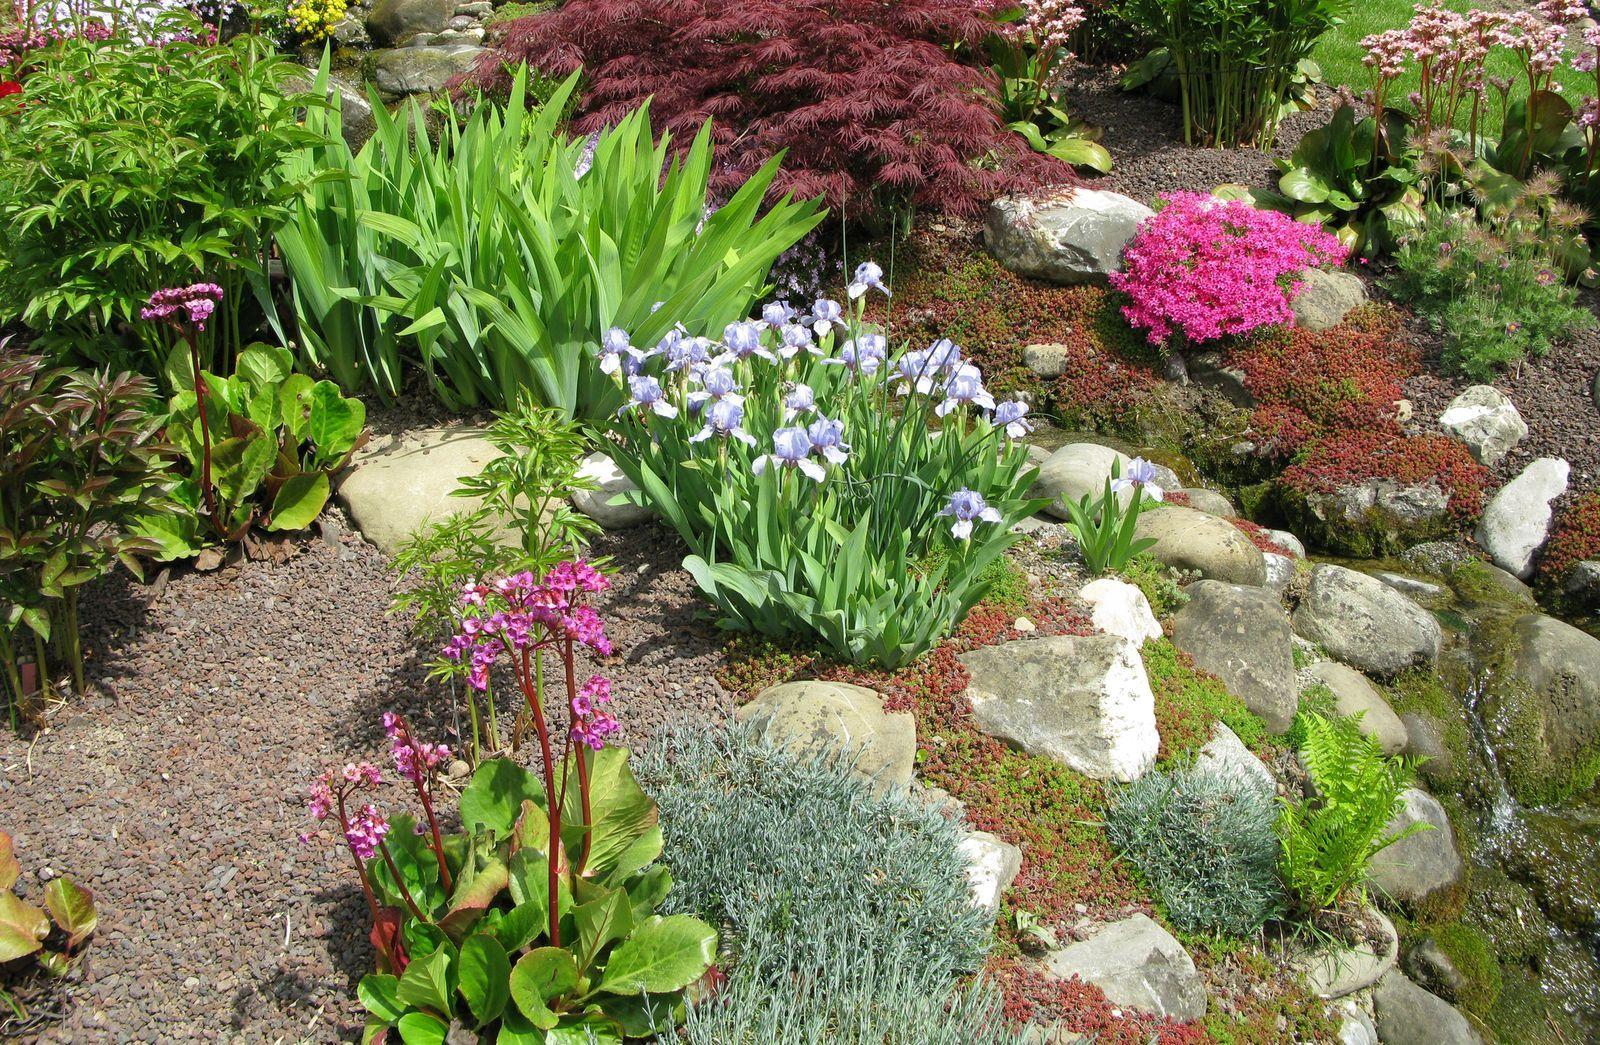 How To Create A Rock Garden In 2020 Rock Garden Plants Landscaping With Rocks Rock Garden Design